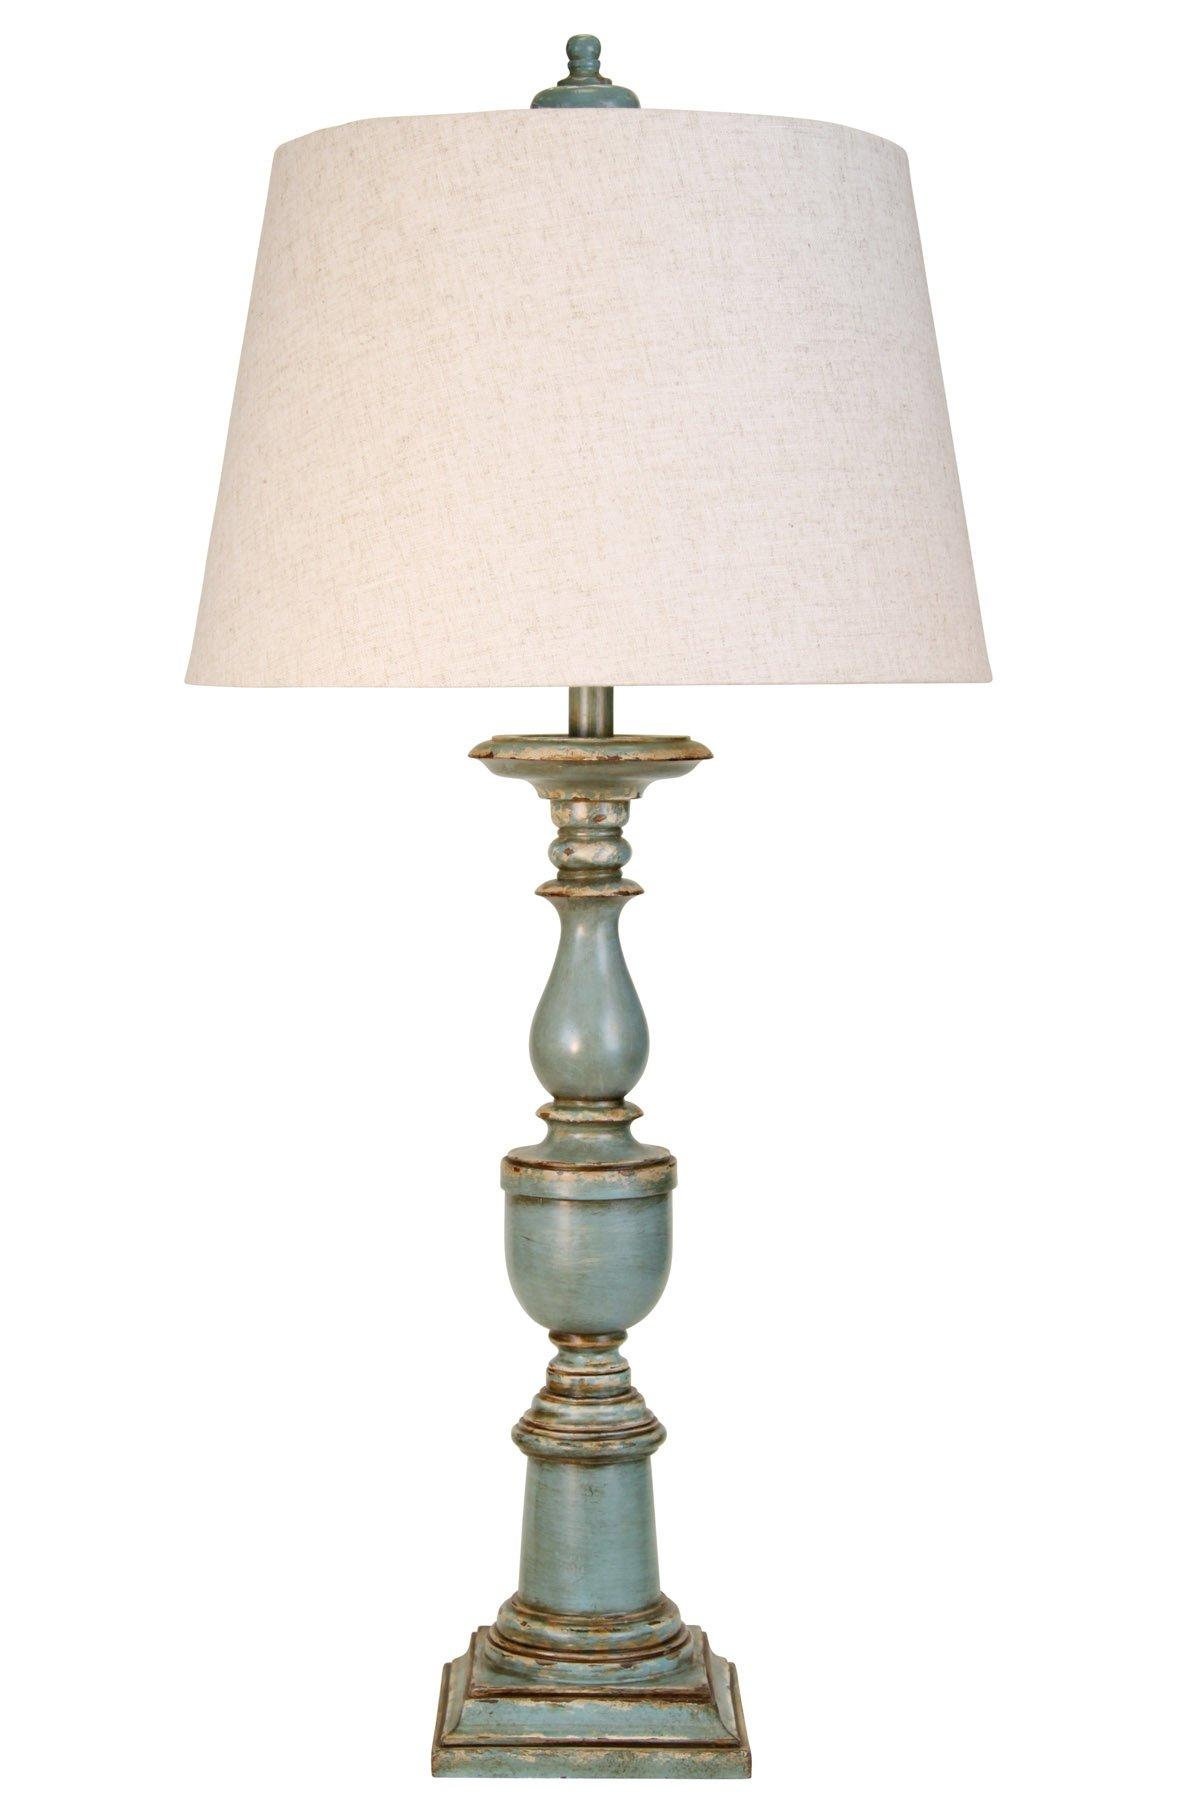 Style Craft L32018 Avignon Table Lamp